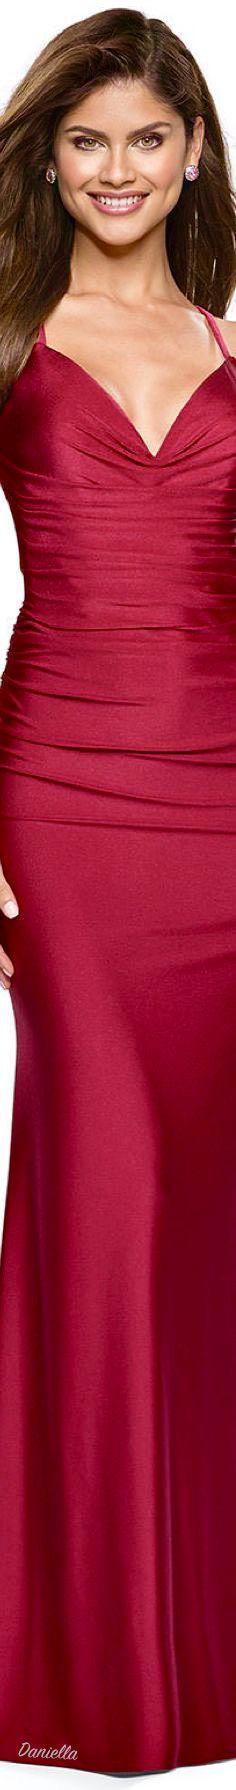 LaFemme #Fashion #LaFemme #Fashion #BurgundyDress #EveningDress #FeminineFashion Orange Leaf, Evening Dresses, Formal Dresses, Fall Is Here, Burgundy Dress, One In A Million, Feminine Style, Glamour, Play Dress